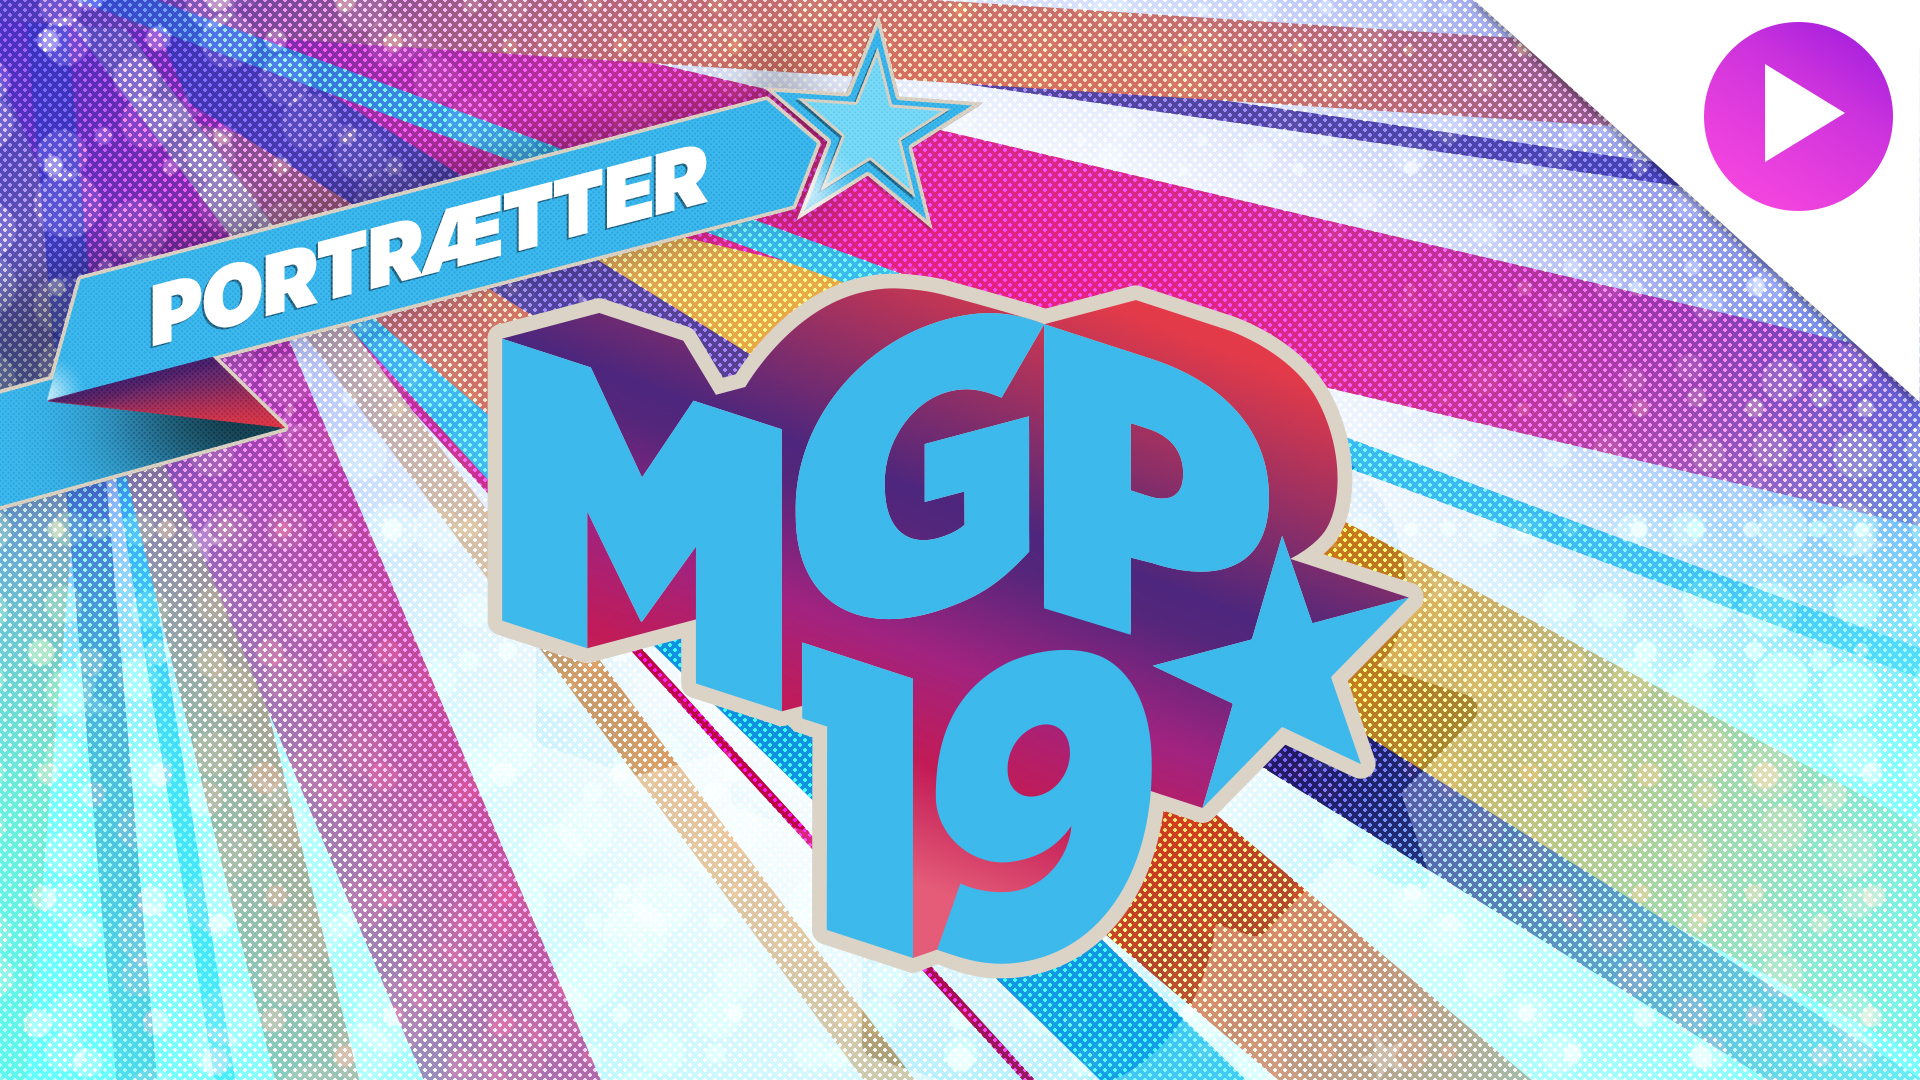 portraetter_mgp_2019_drupal.jpg